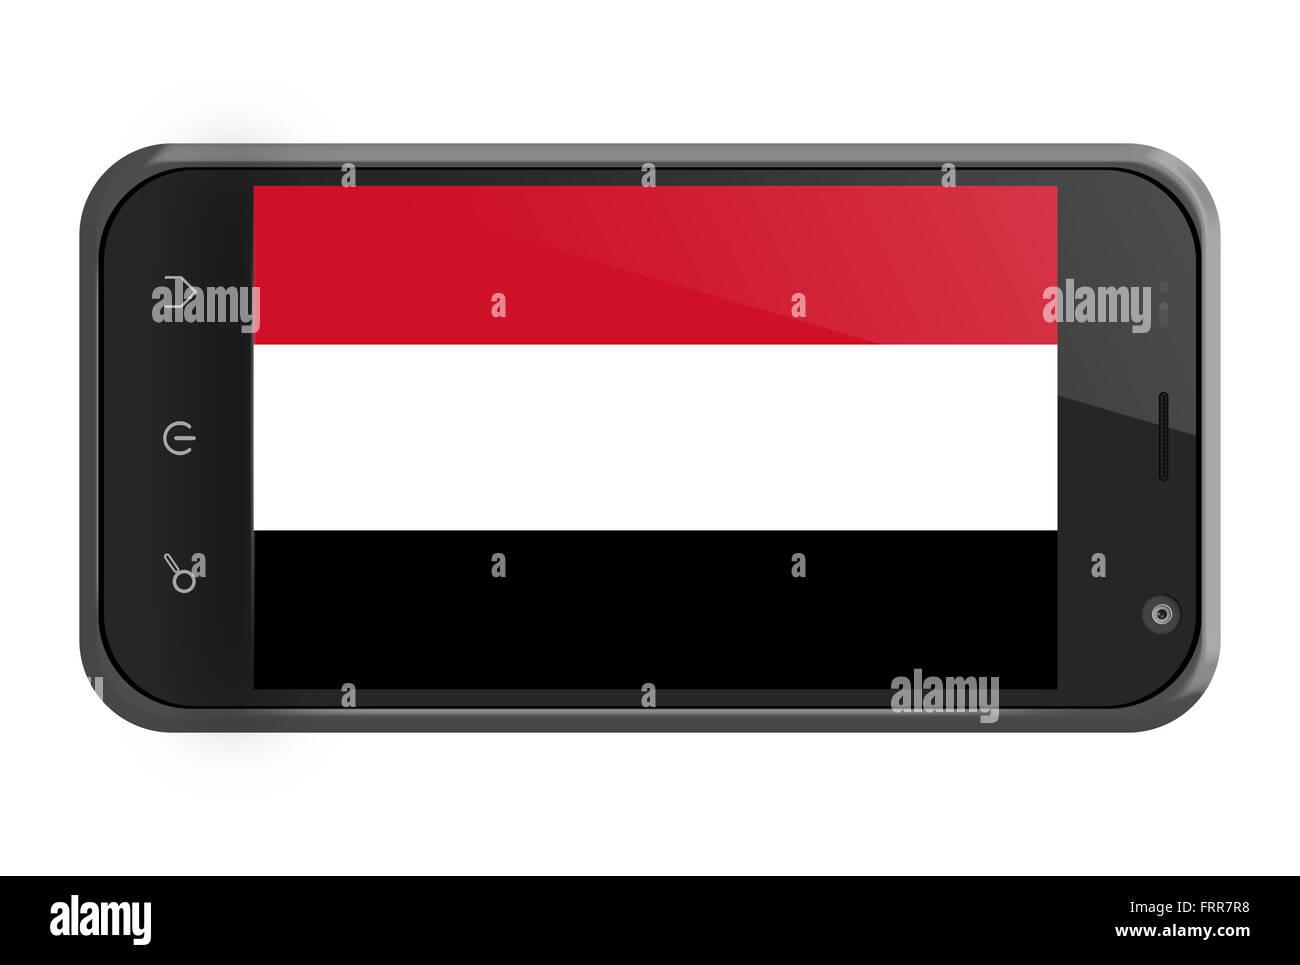 Yemen flag on smartphone screen isolated on white - Stock Image